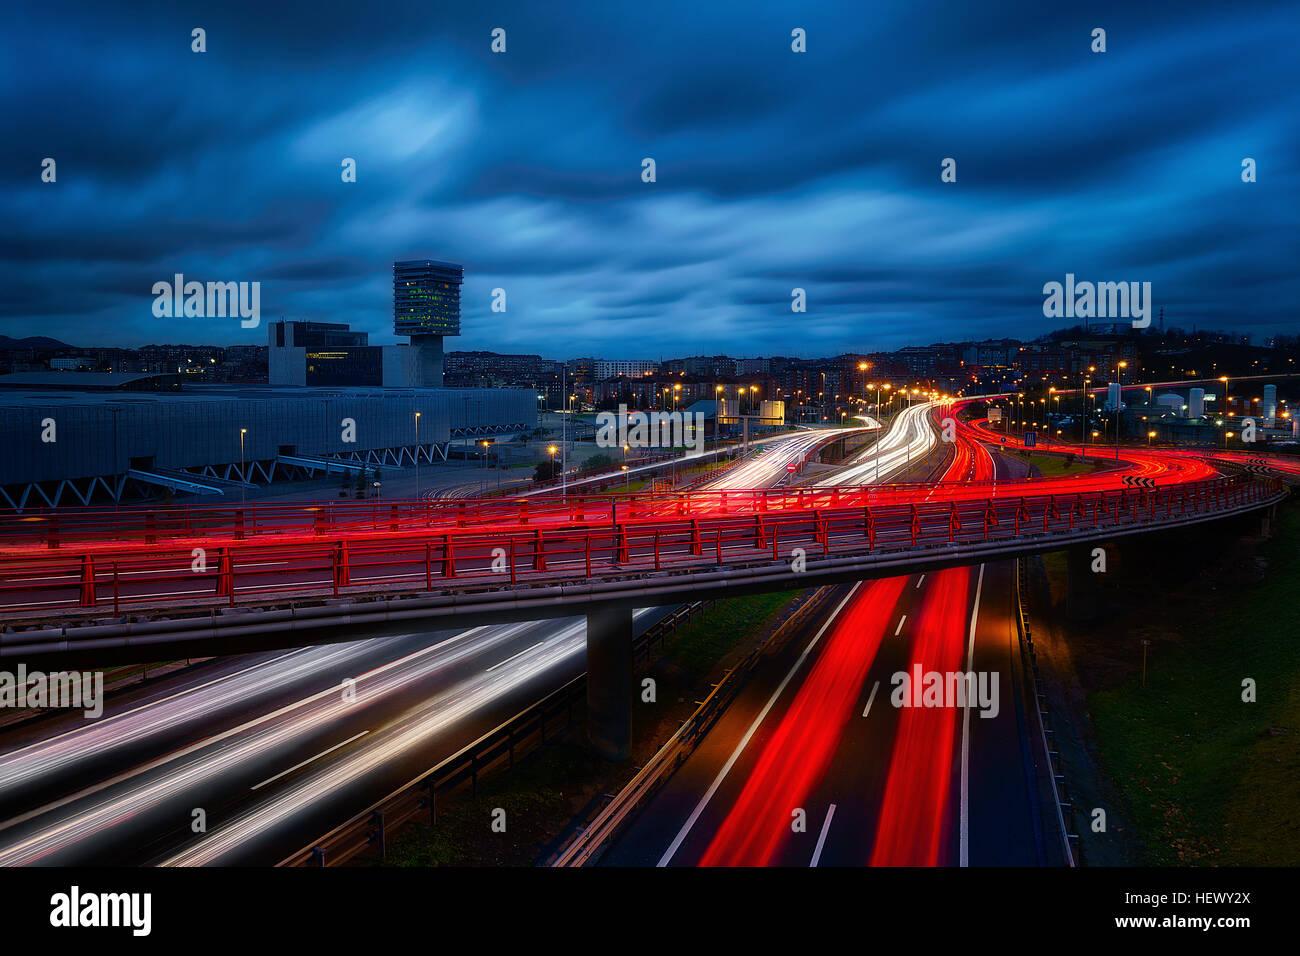 light trails in Bilbao night - Stock Image